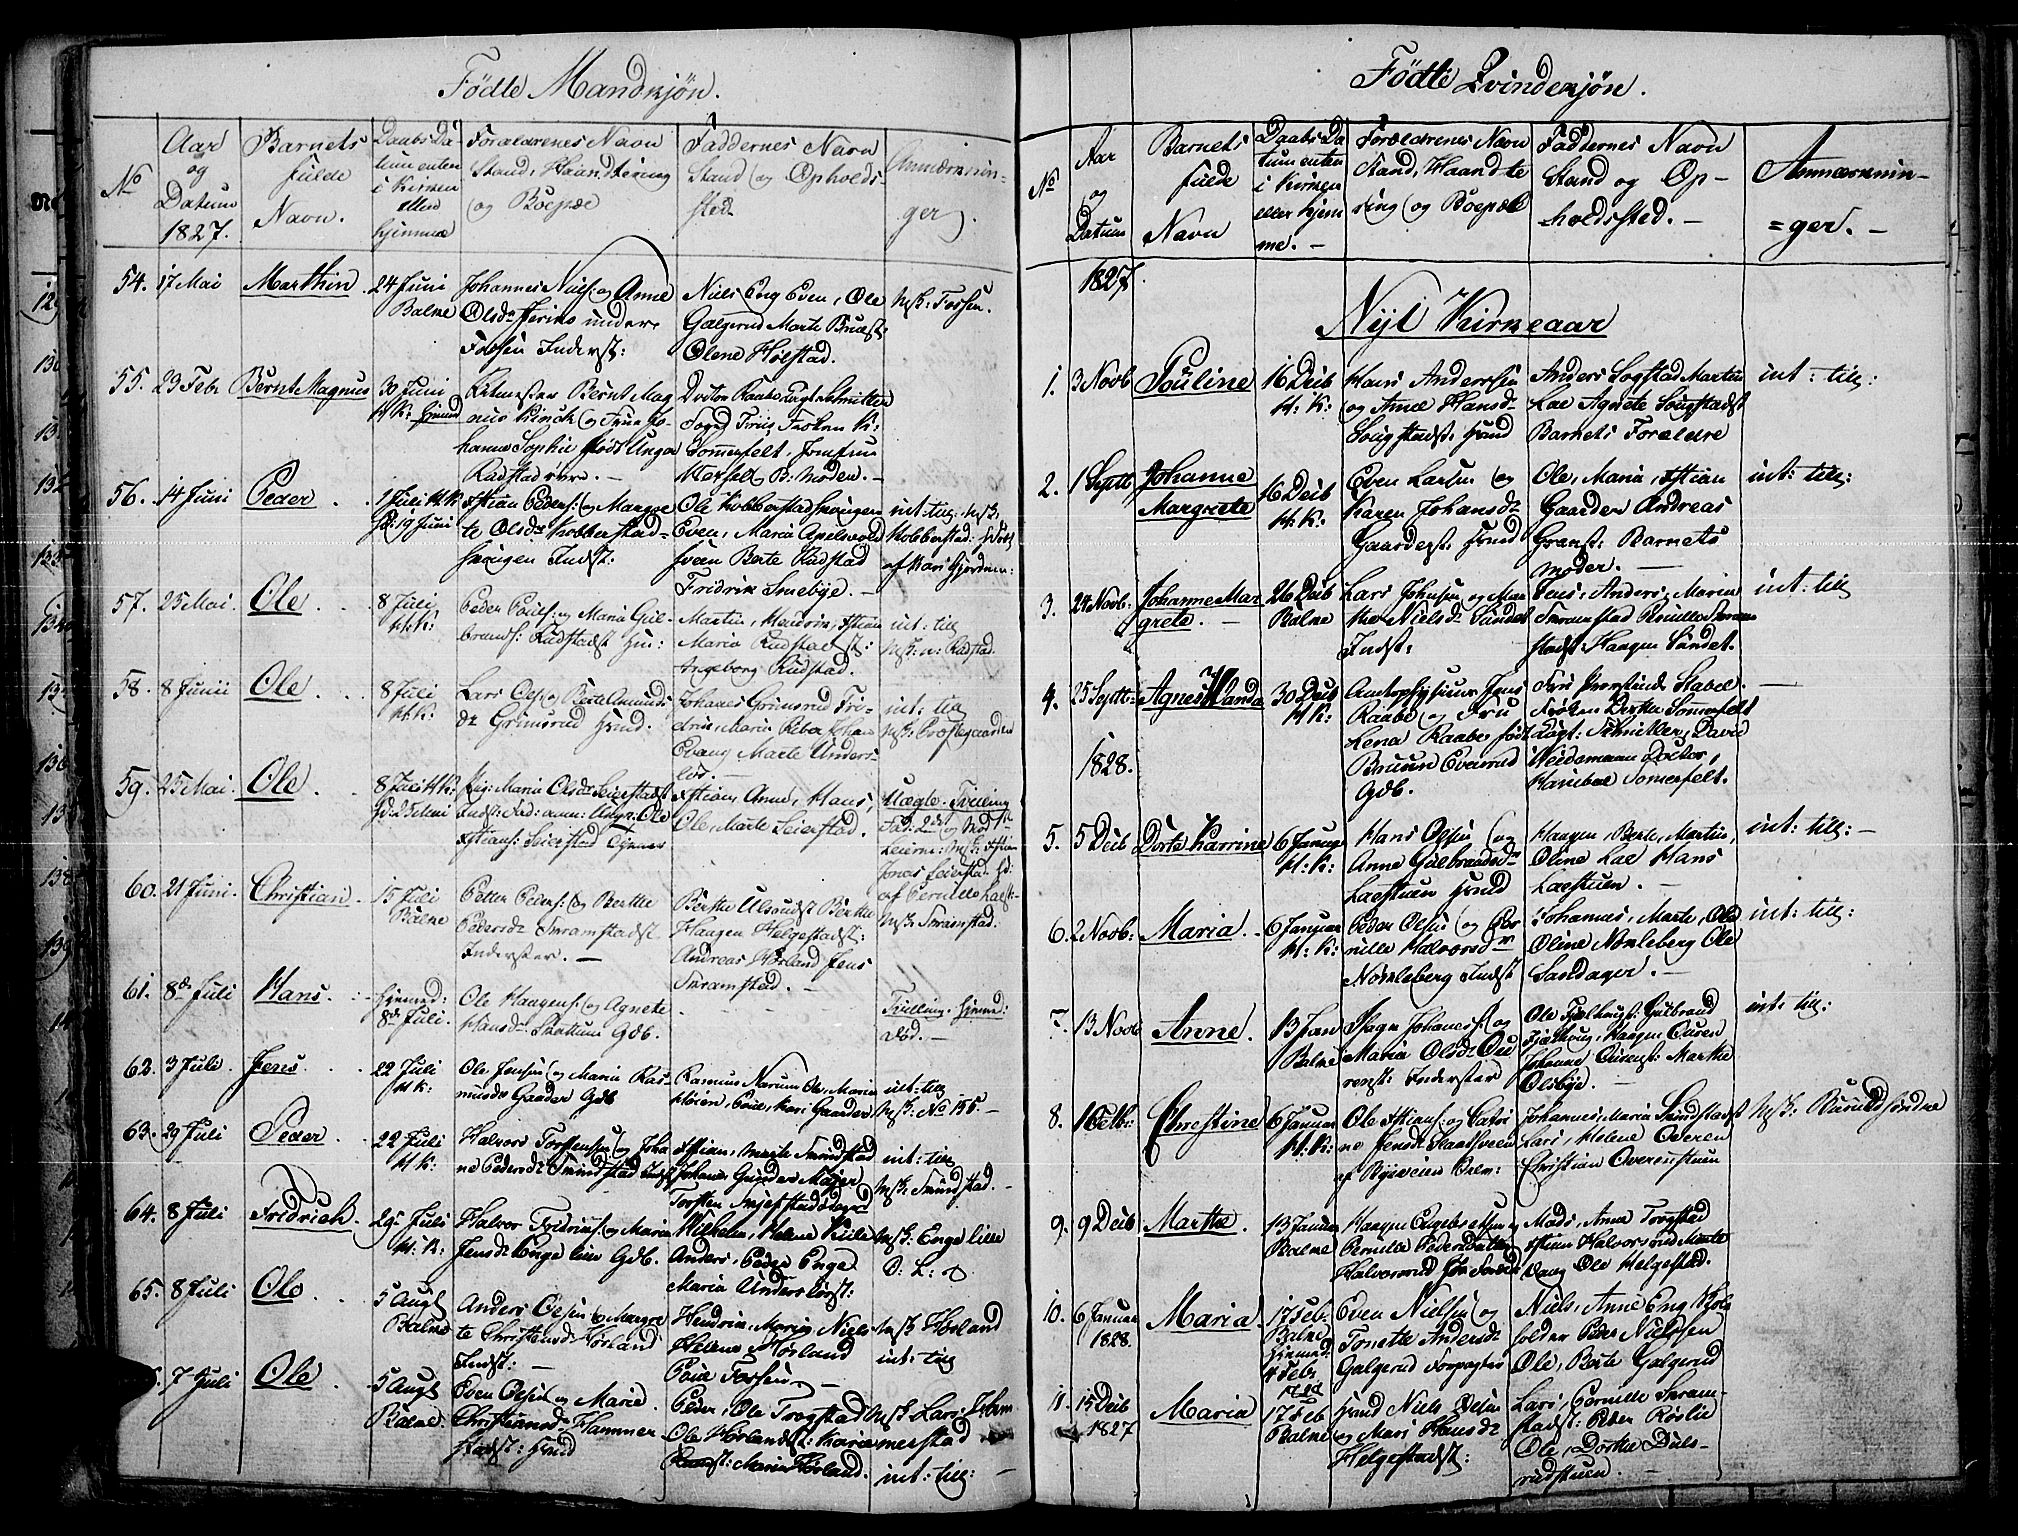 SAH, Toten prestekontor, Ministerialbok nr. 10, 1820-1828